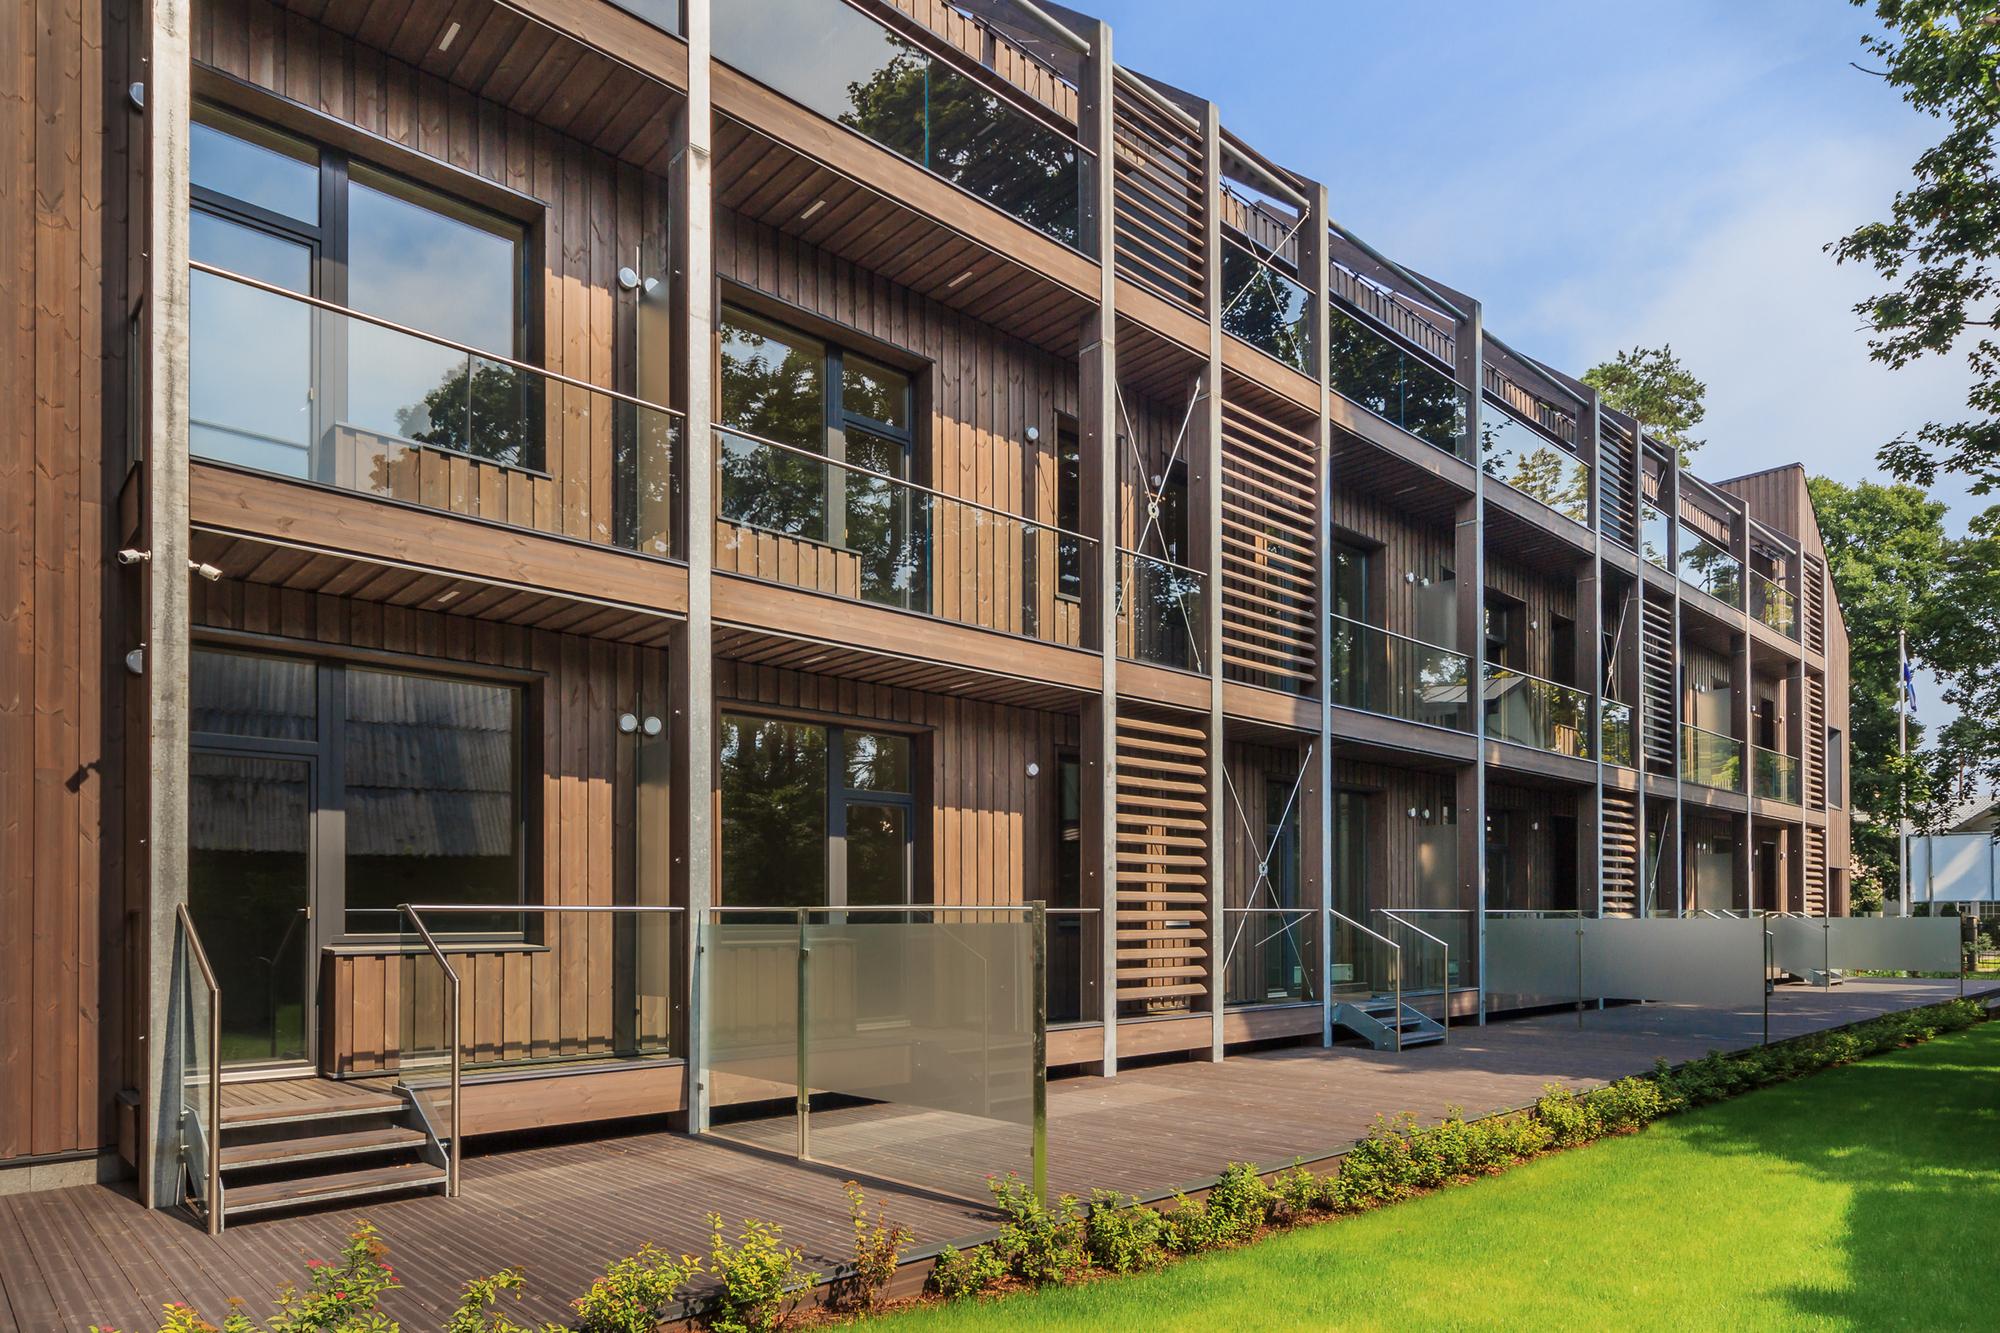 Gallery Of Erg 6 Apartment Building Arhitektu Birojs Mg Arhitekti 6